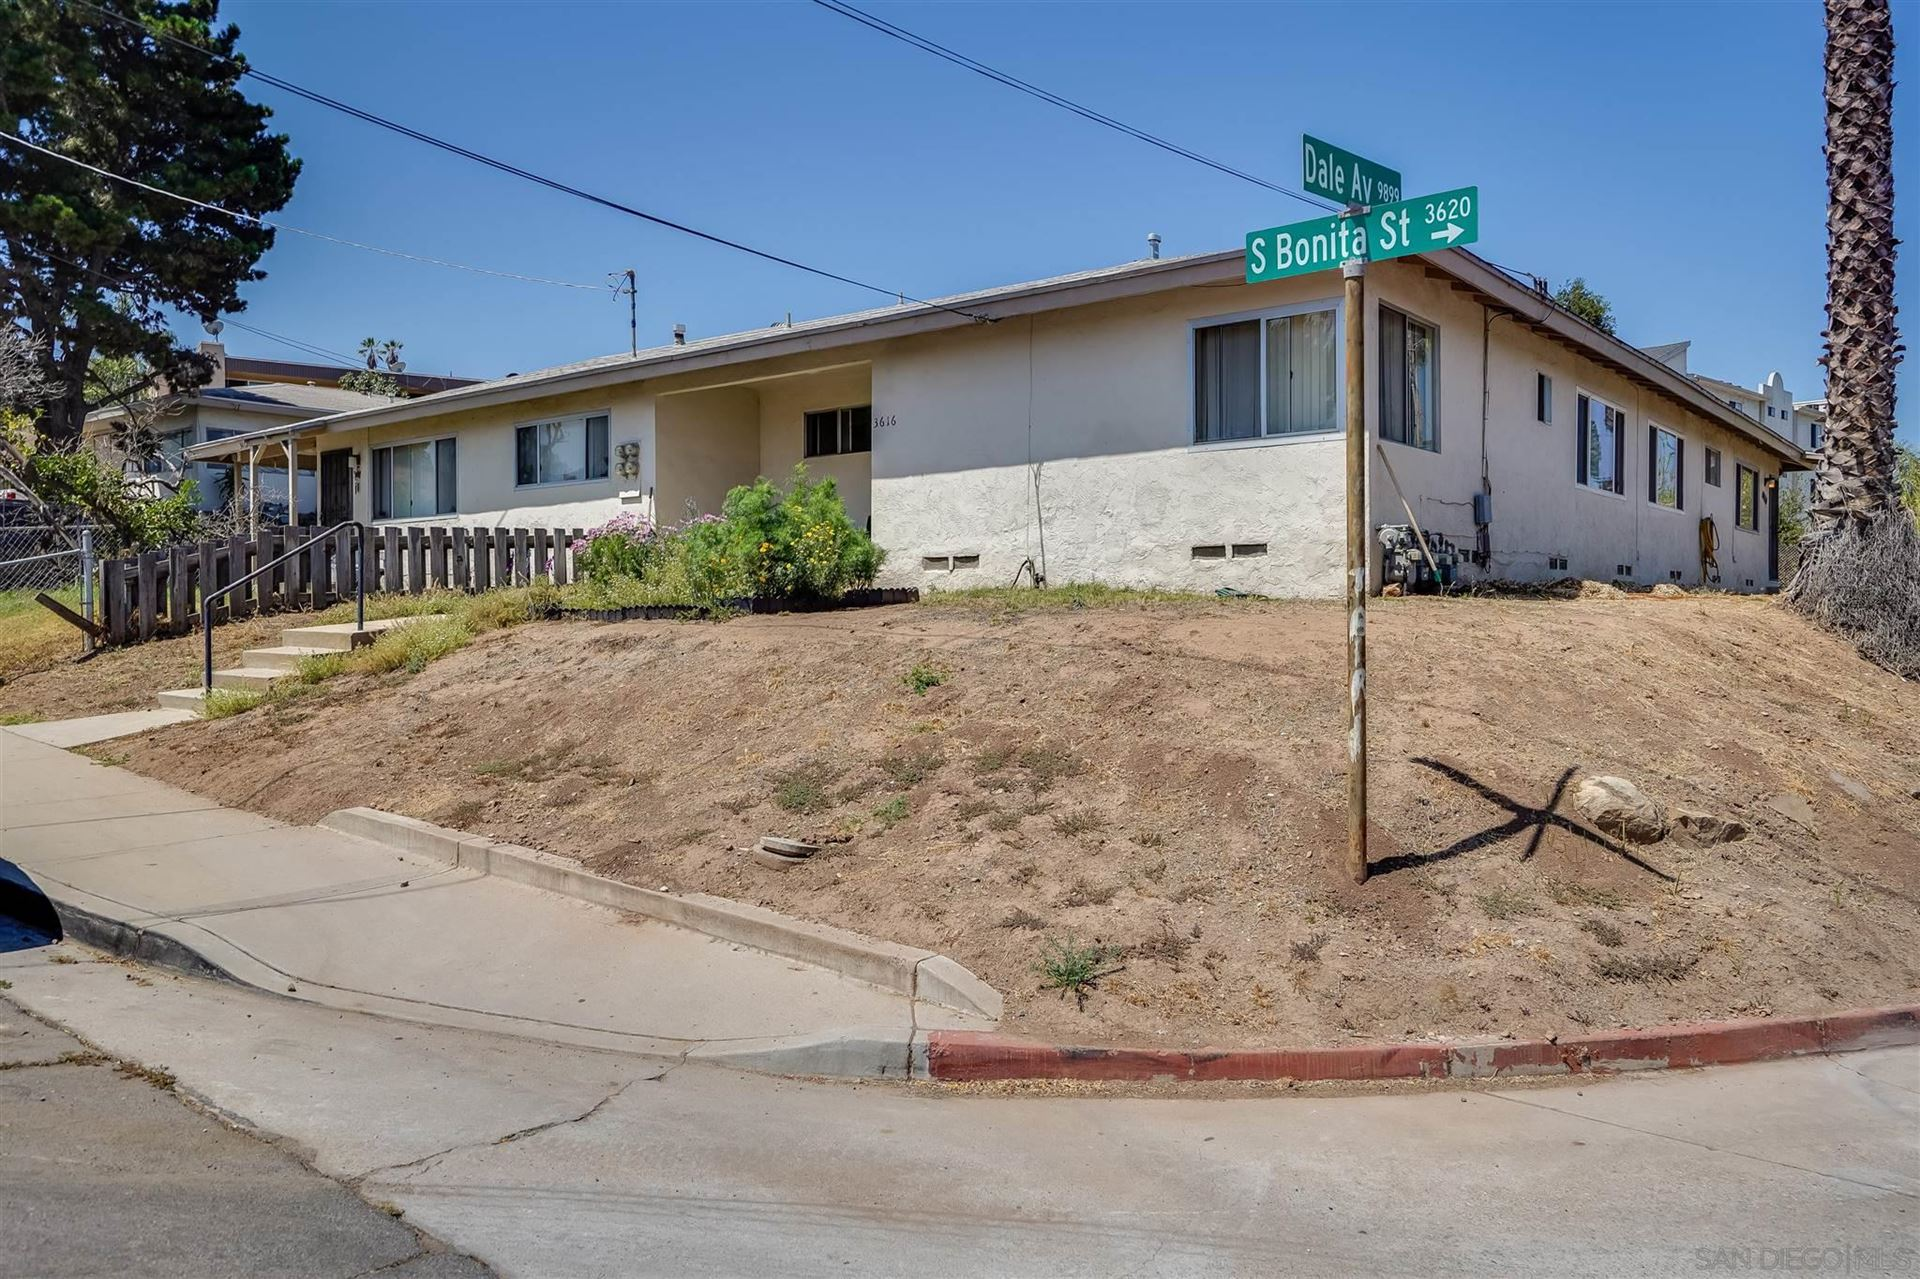 Photo of 3612-16 S Bonita St, Spring Valley, CA 91977 (MLS # 210020759)